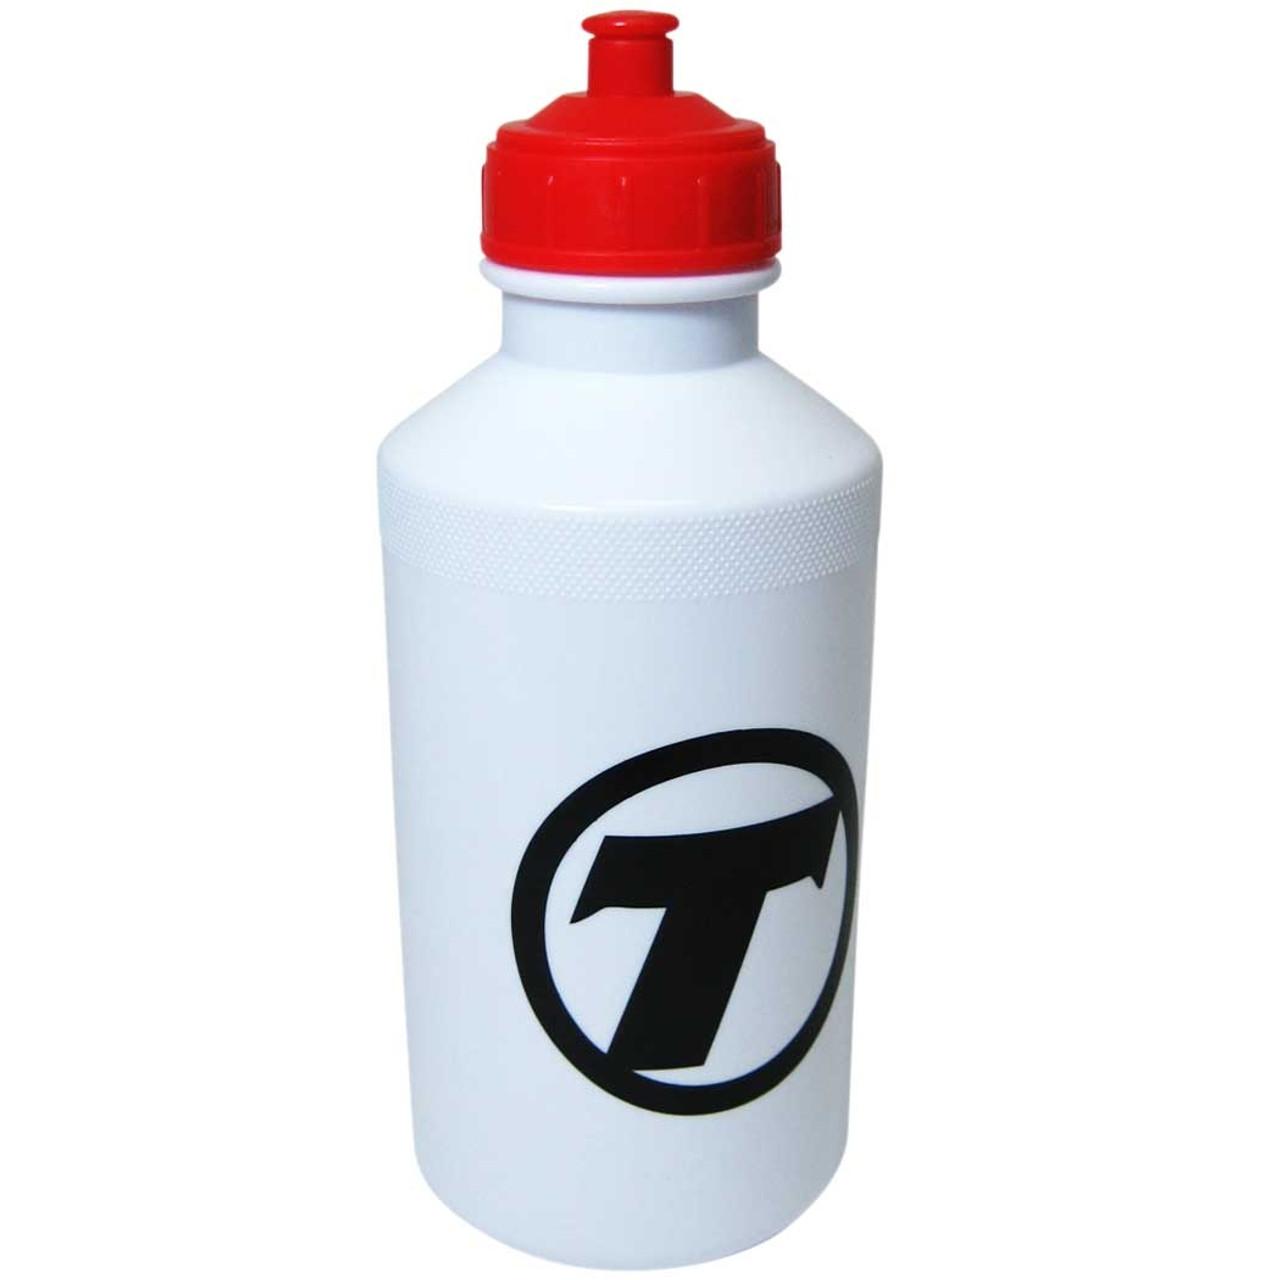 Tron Elite Water Bottle Push Top